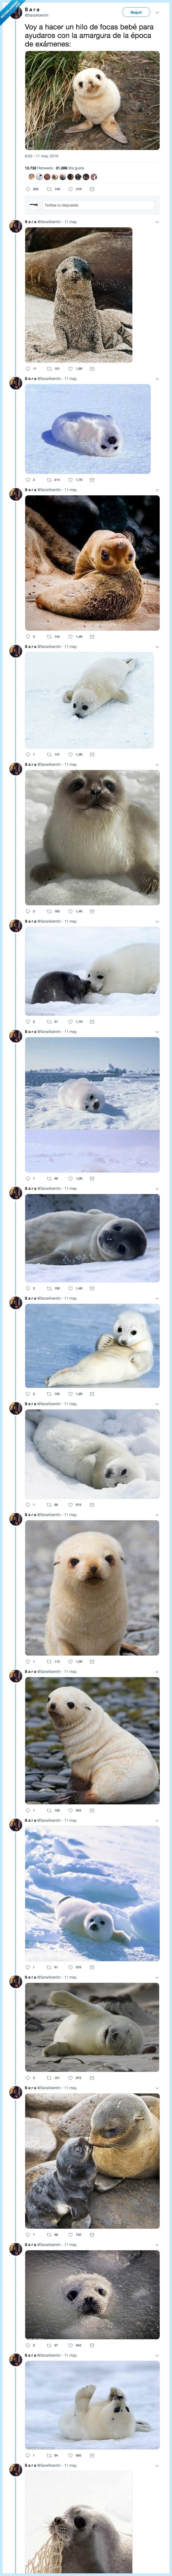 epoca exámenes,foca,hilo,me flipan las focas